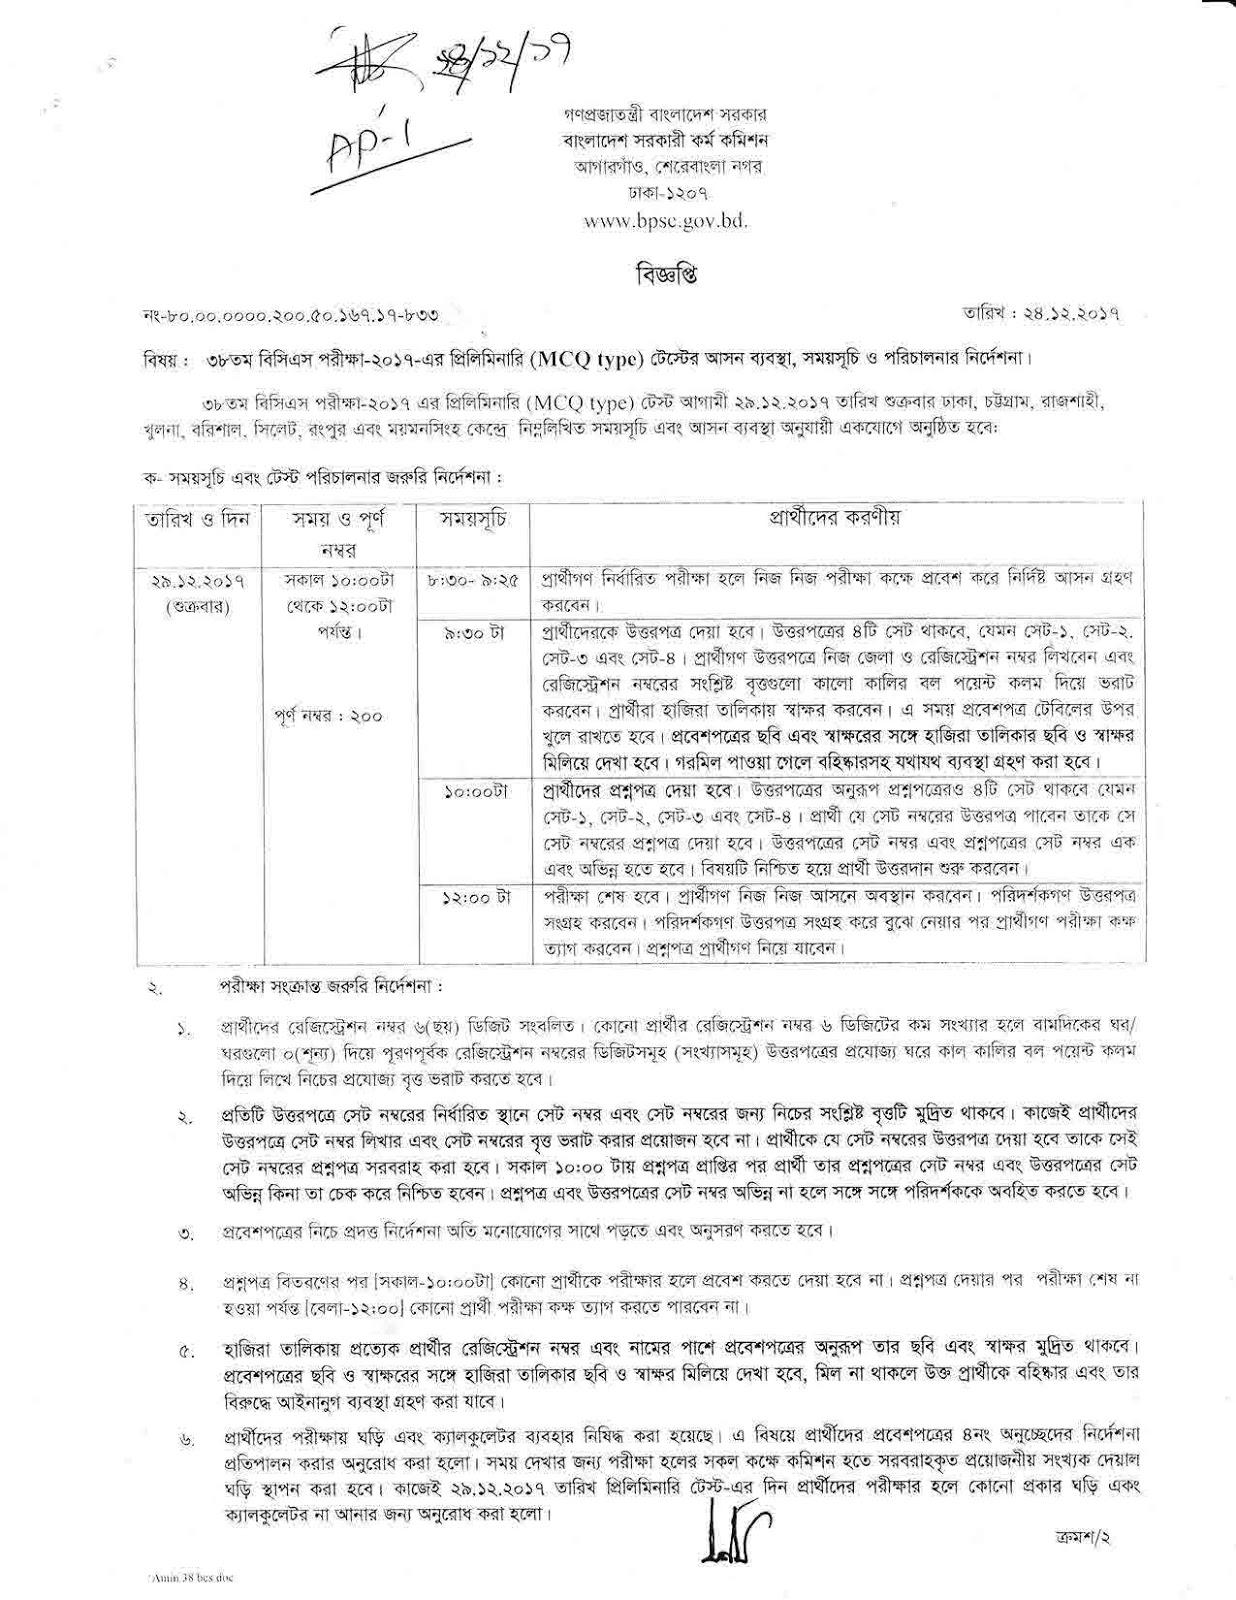 38th BCS Preli Exam Date 29 December 2017 & Seat Plan Notice